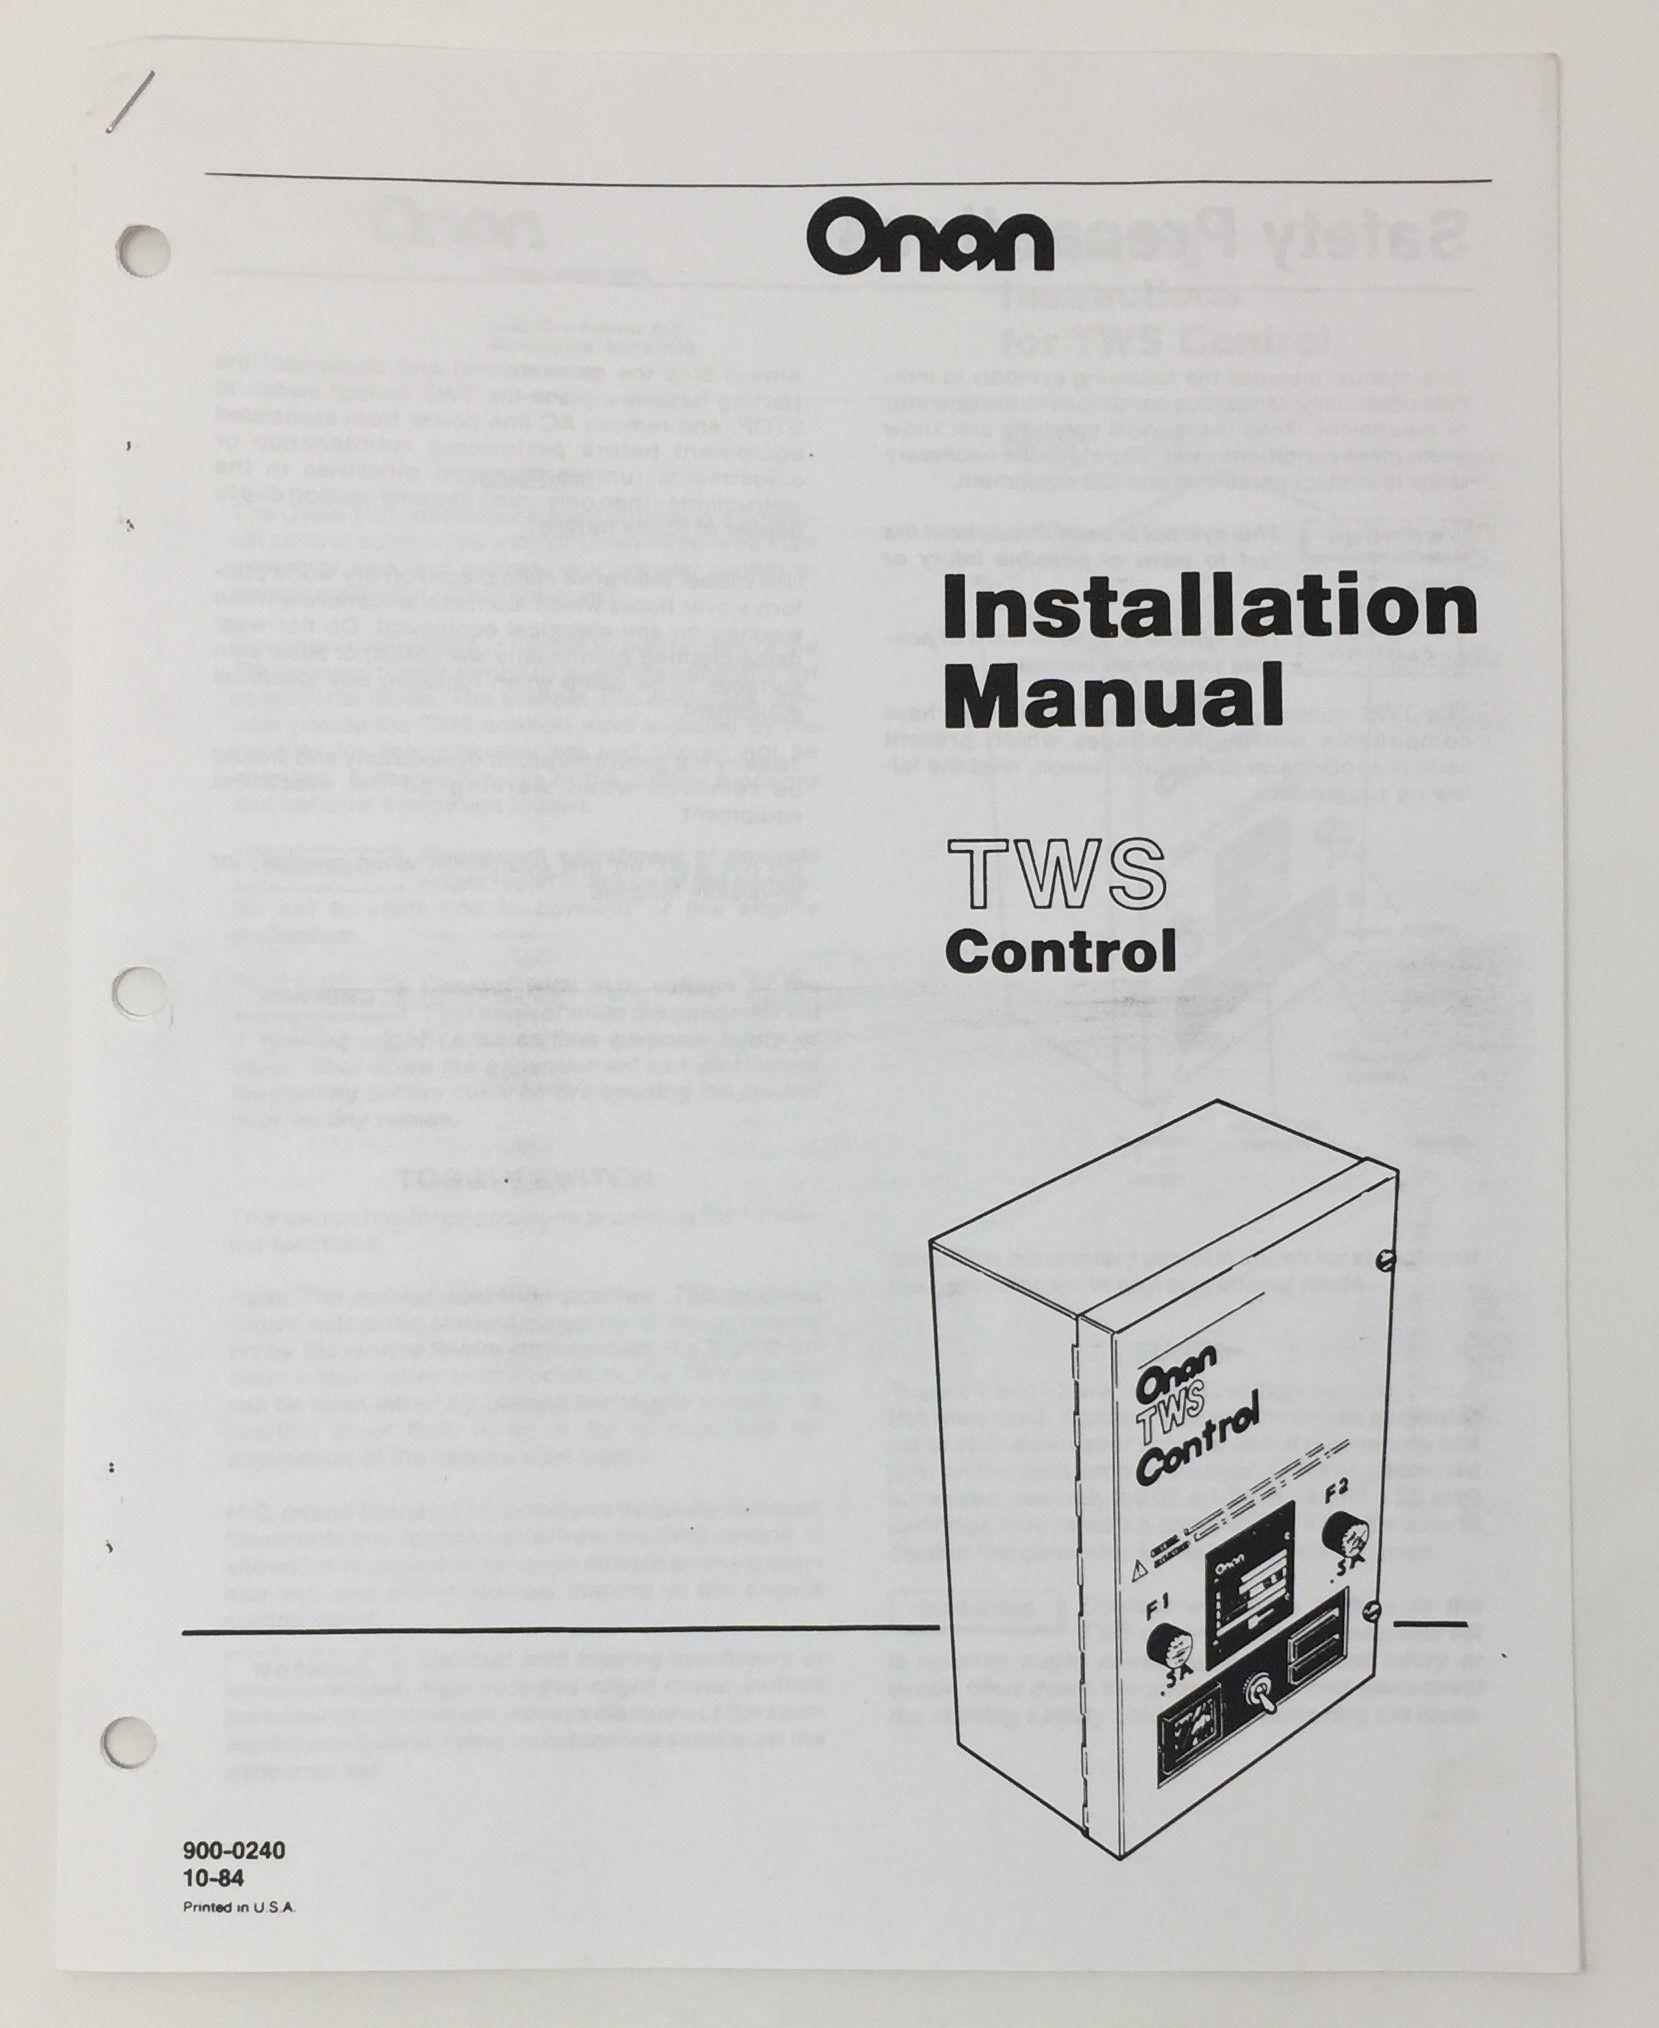 Onan Tws Control Insallation Manual 900 0240 10 84 Copy Onan Manual Control